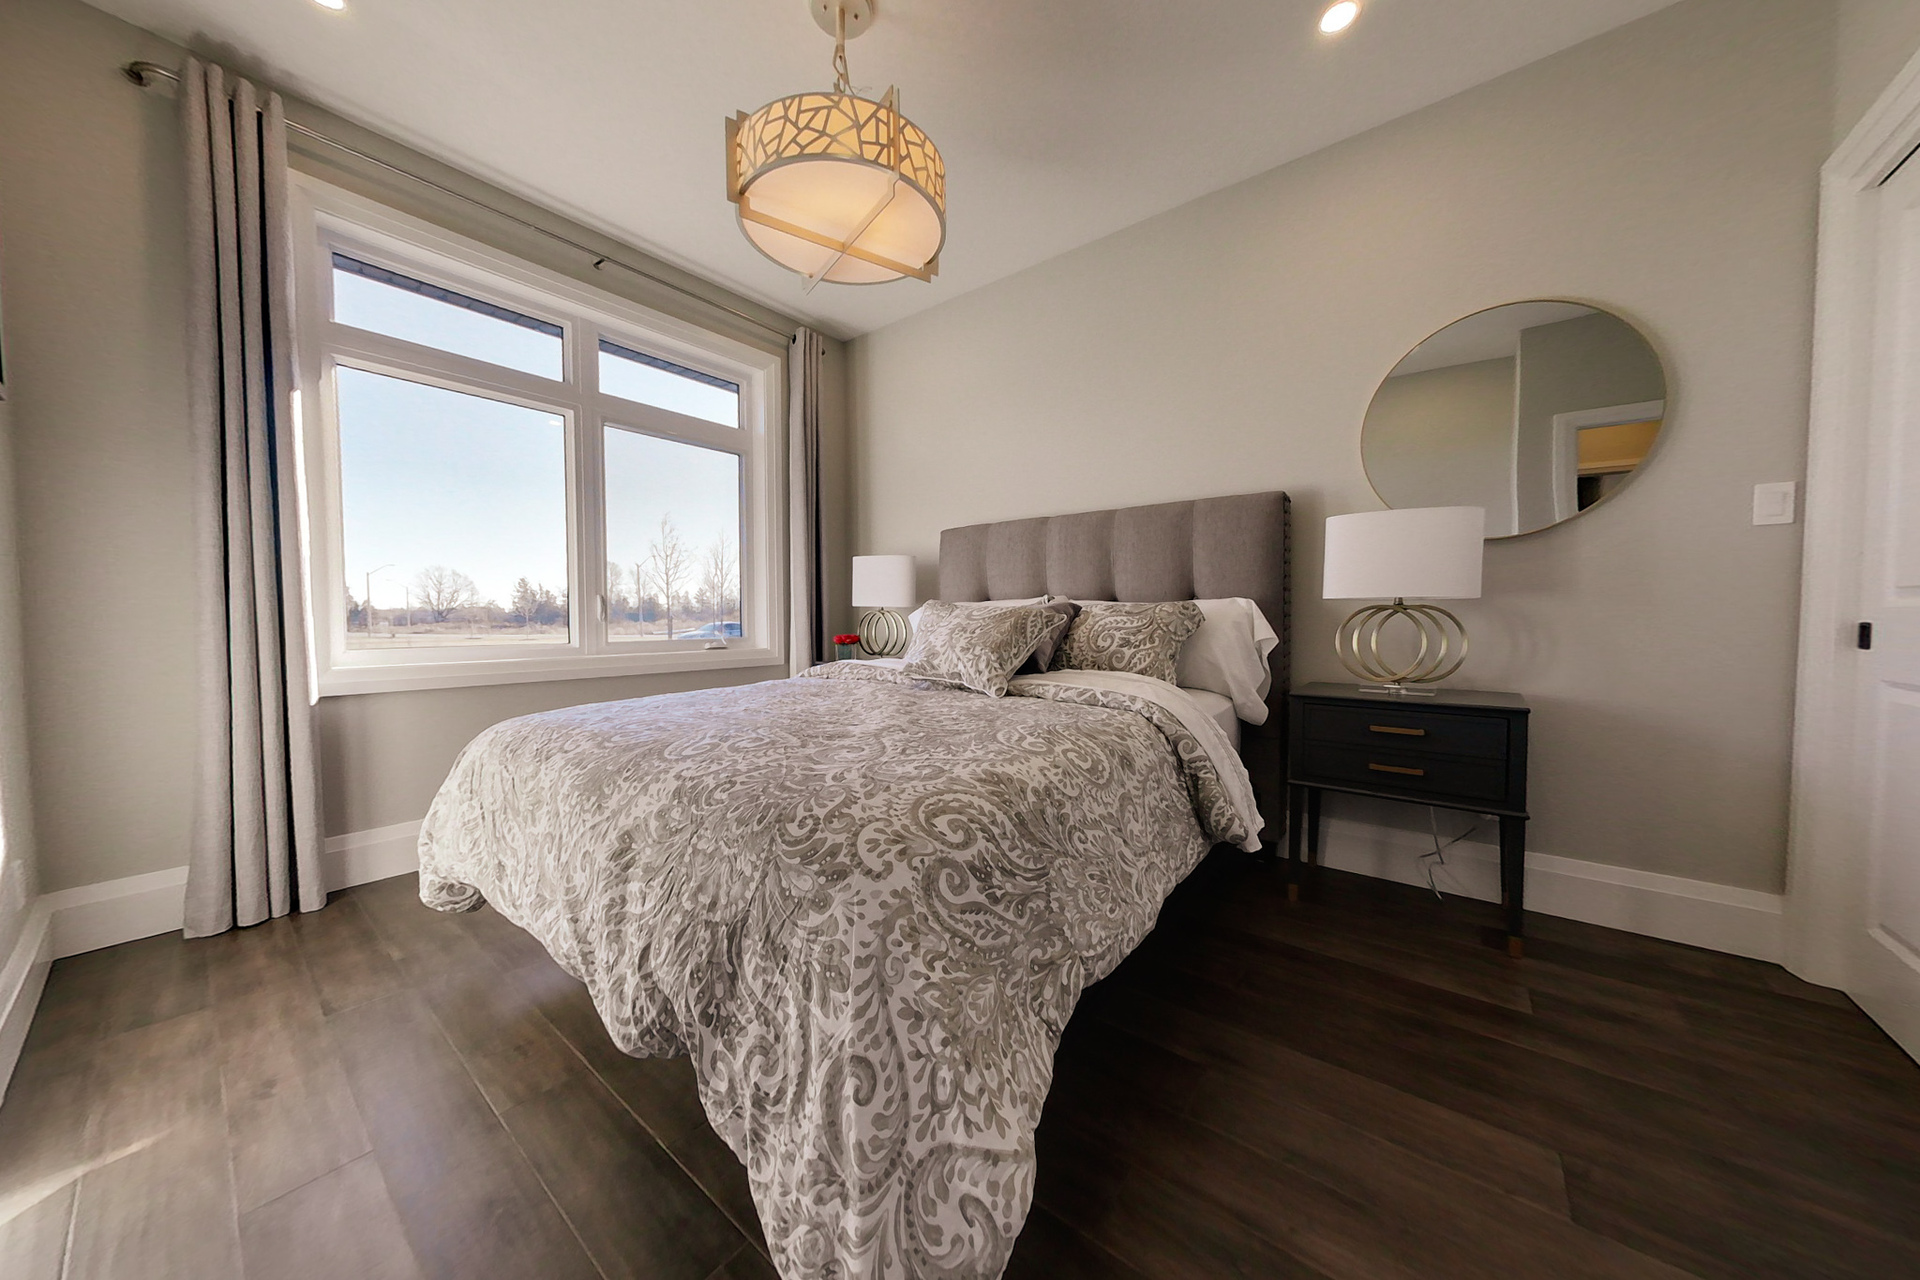 77-navigation-drive-bedroom-3 at 77 Navigation Drive, Prince Edward County,